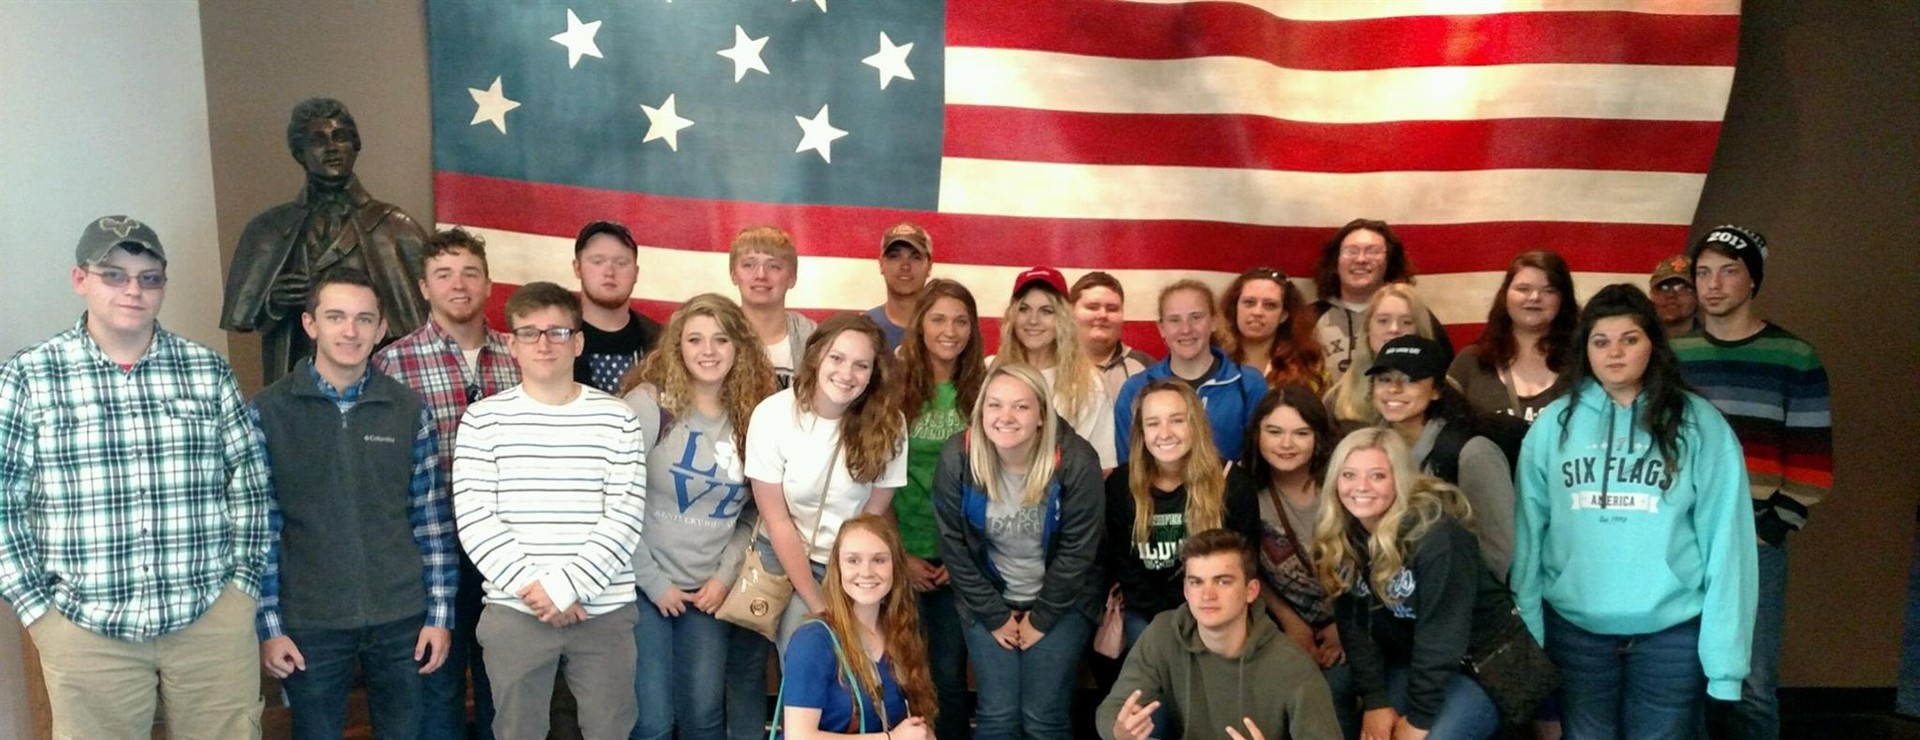 MCHS Senior Trip 2017